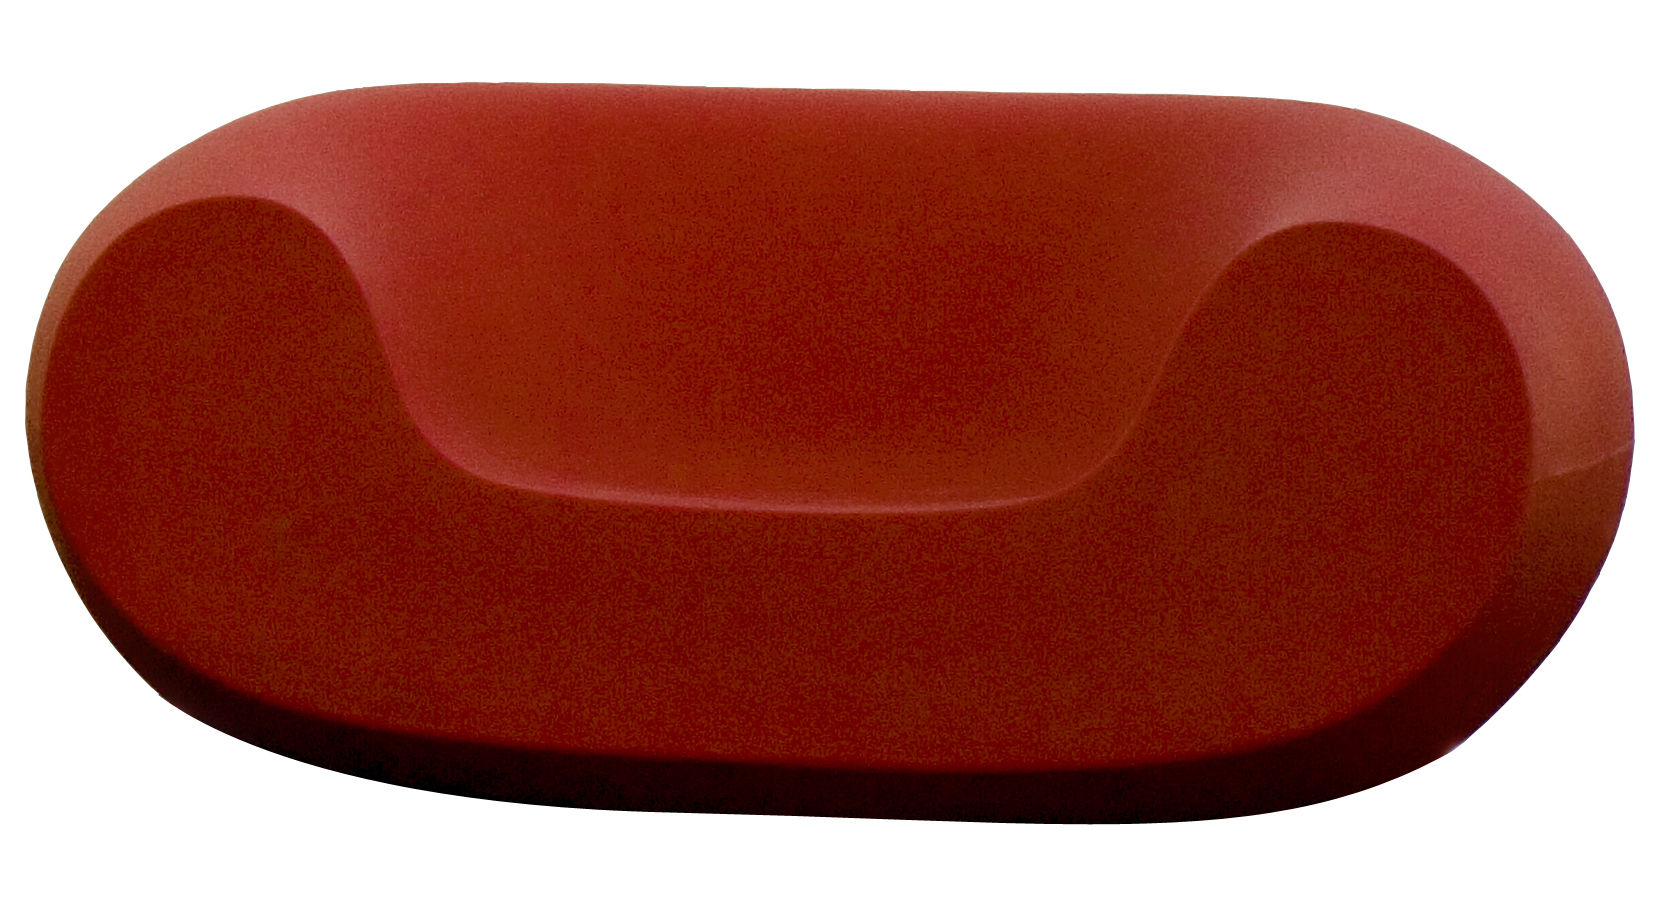 Arredamento - Mobili Ados  - Poltrona bassa Chubby di Slide - Rosso - Polietilene